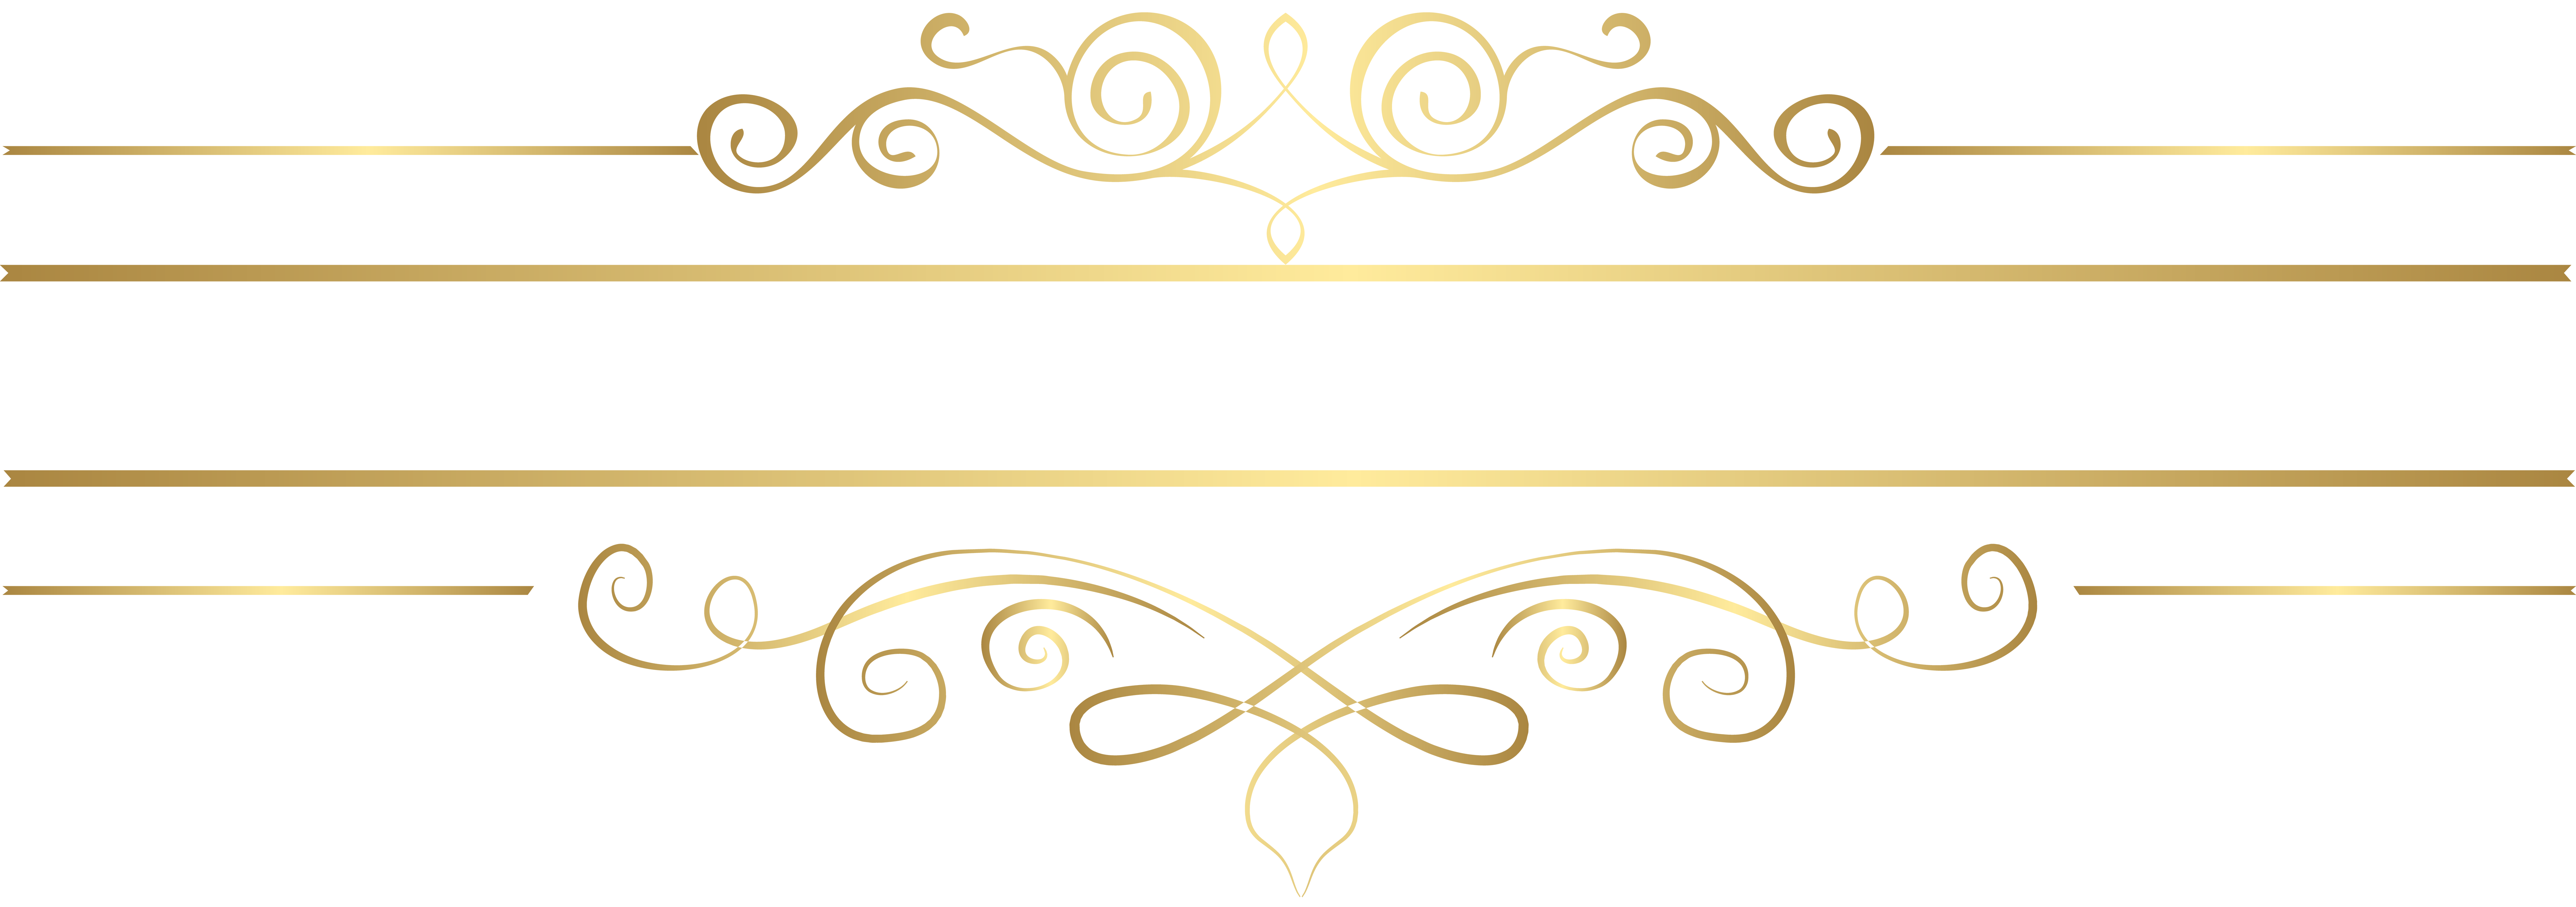 Gold Decorative Element Transparent Clip Art.